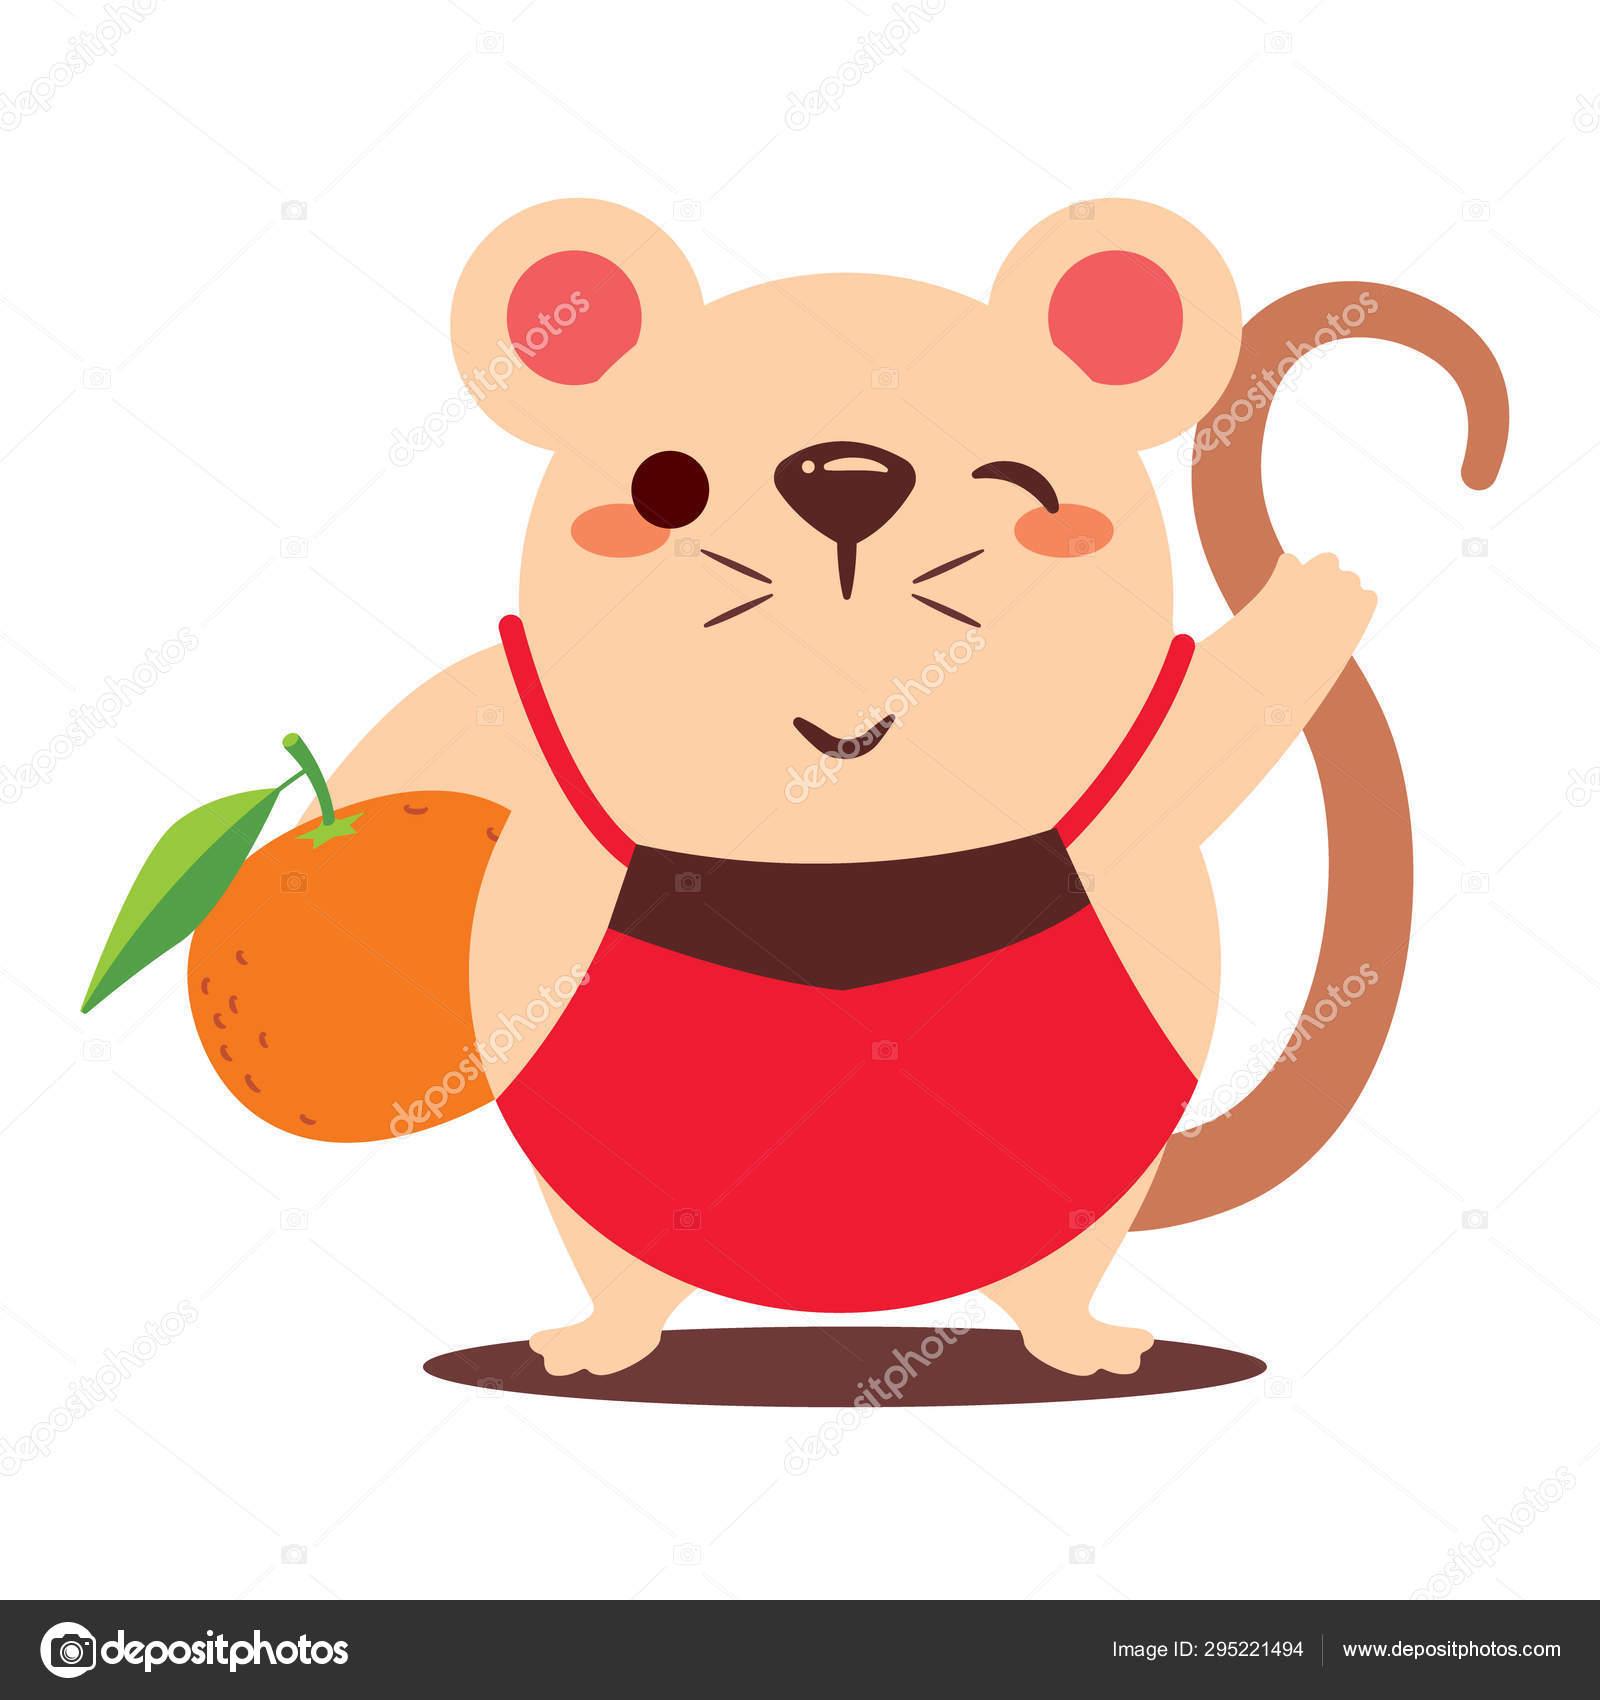 Rato Bonito Dos Desenhos Animados Que Carreg Laranja Grande